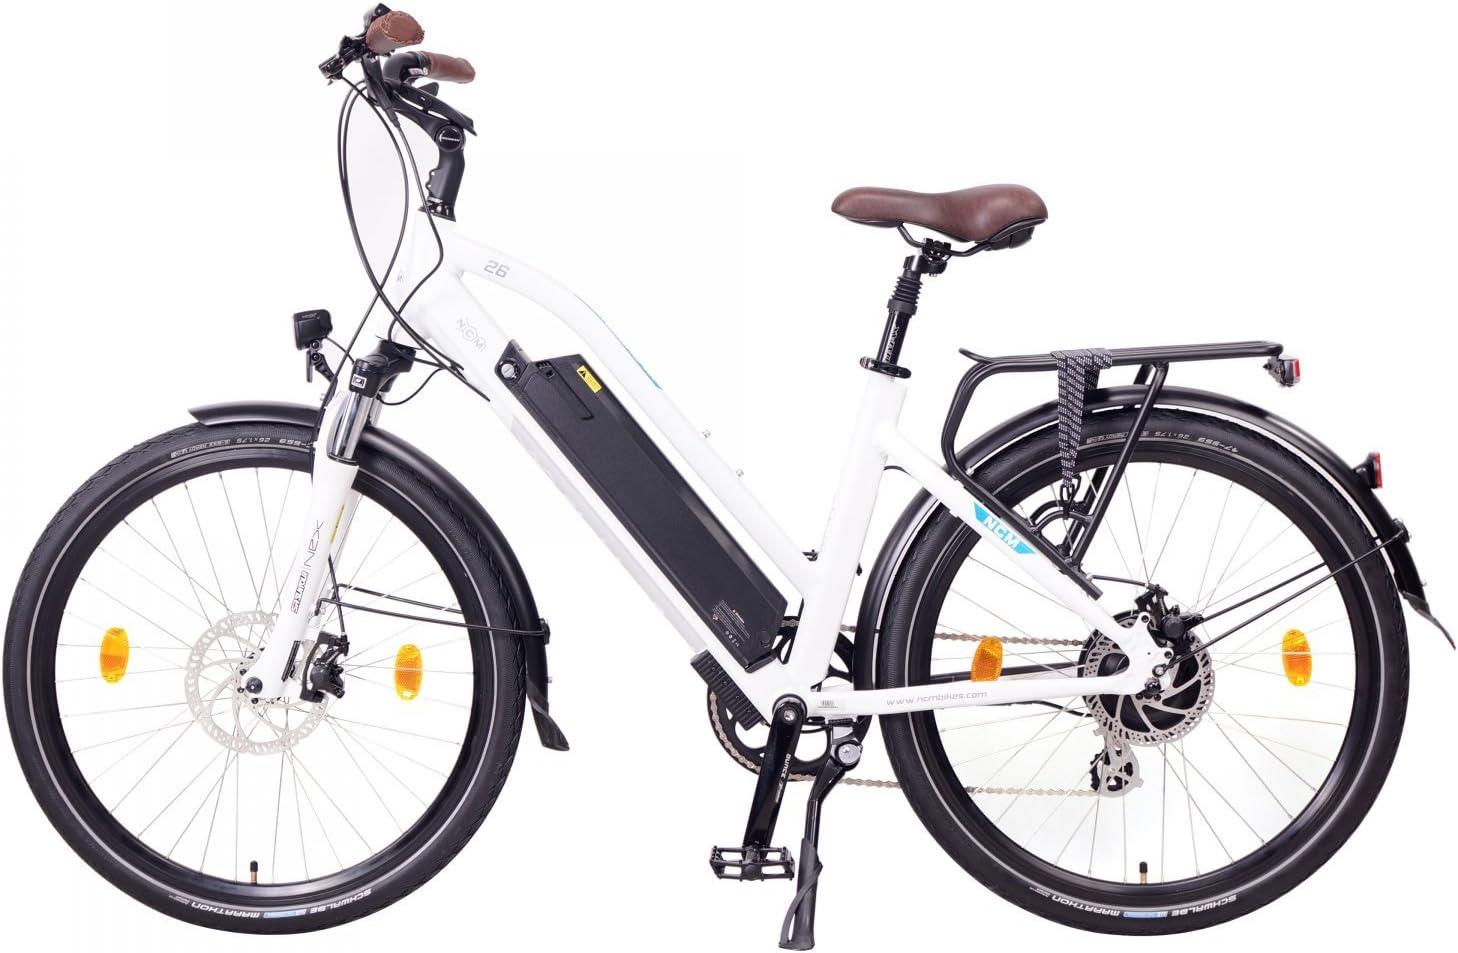 wei/ß NCM Milano 48V schwarz 26 // 28 Urban Trekking E-Bike Elektrofahrrad Pedelec 250W 13Ah 624Wh